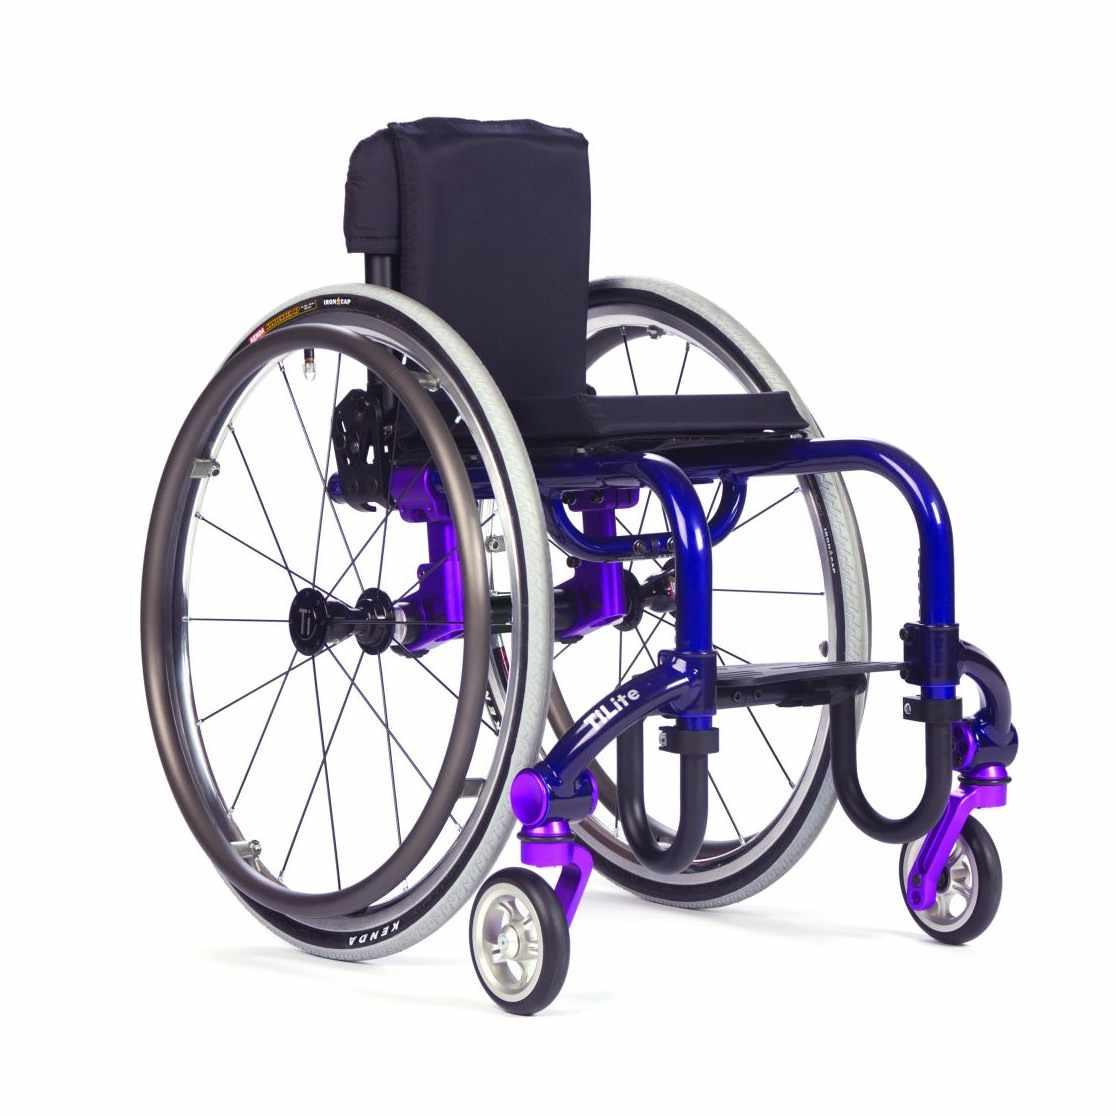 TiLite Twist pediatric ultralight wheelchair